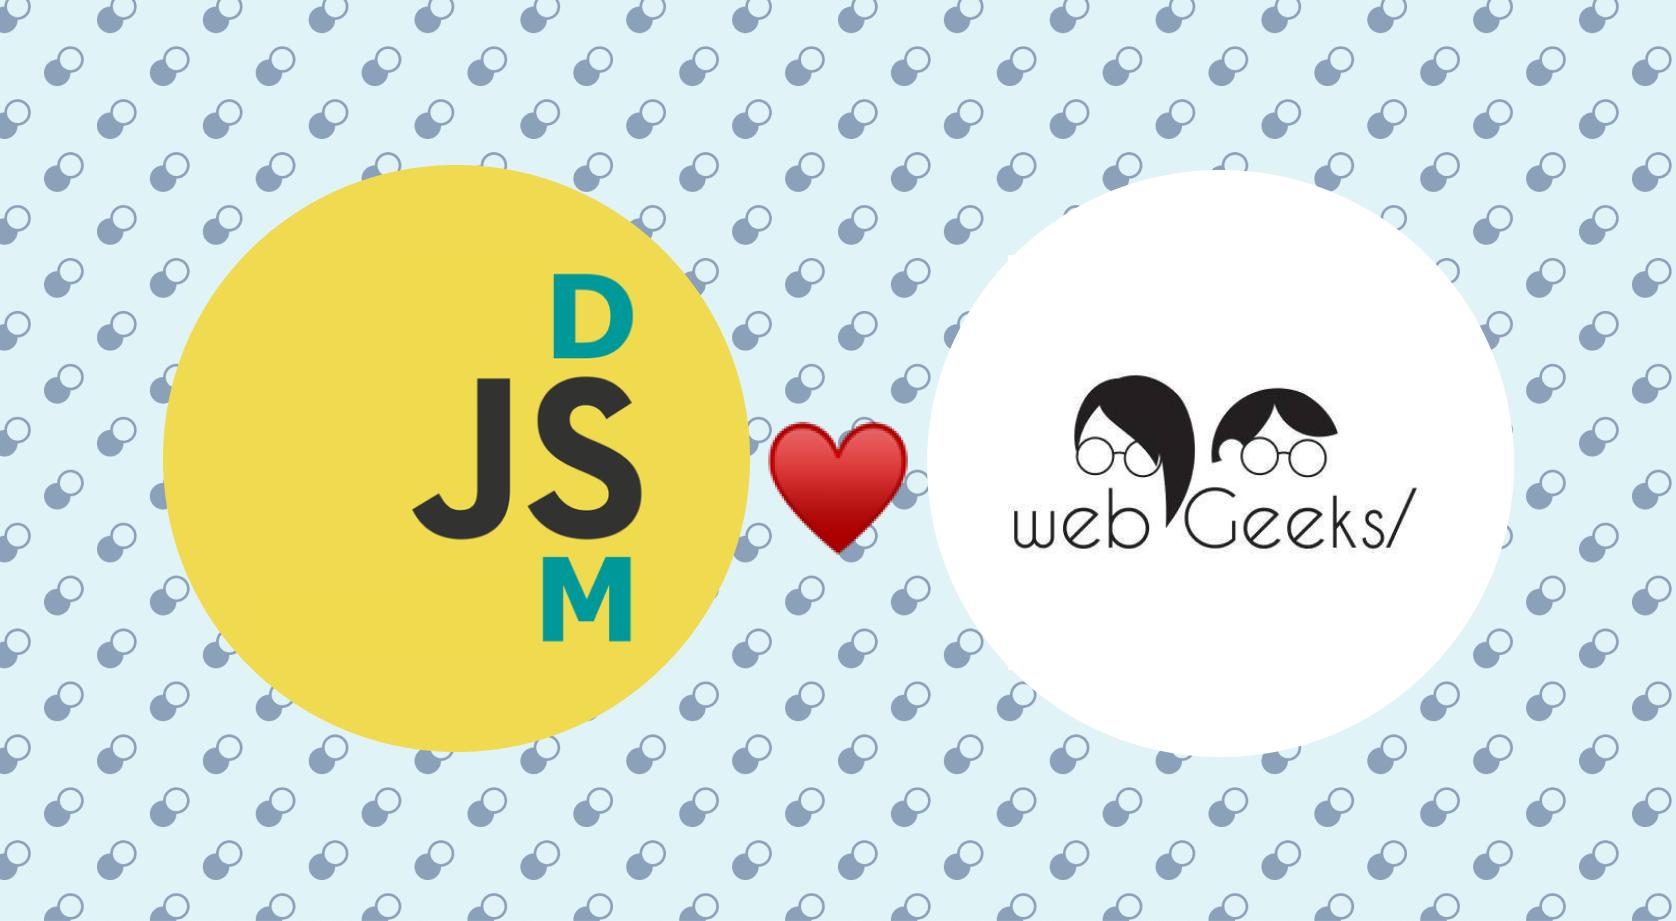 Web Geeks/dsmJS Spring (Virtual) Gathering